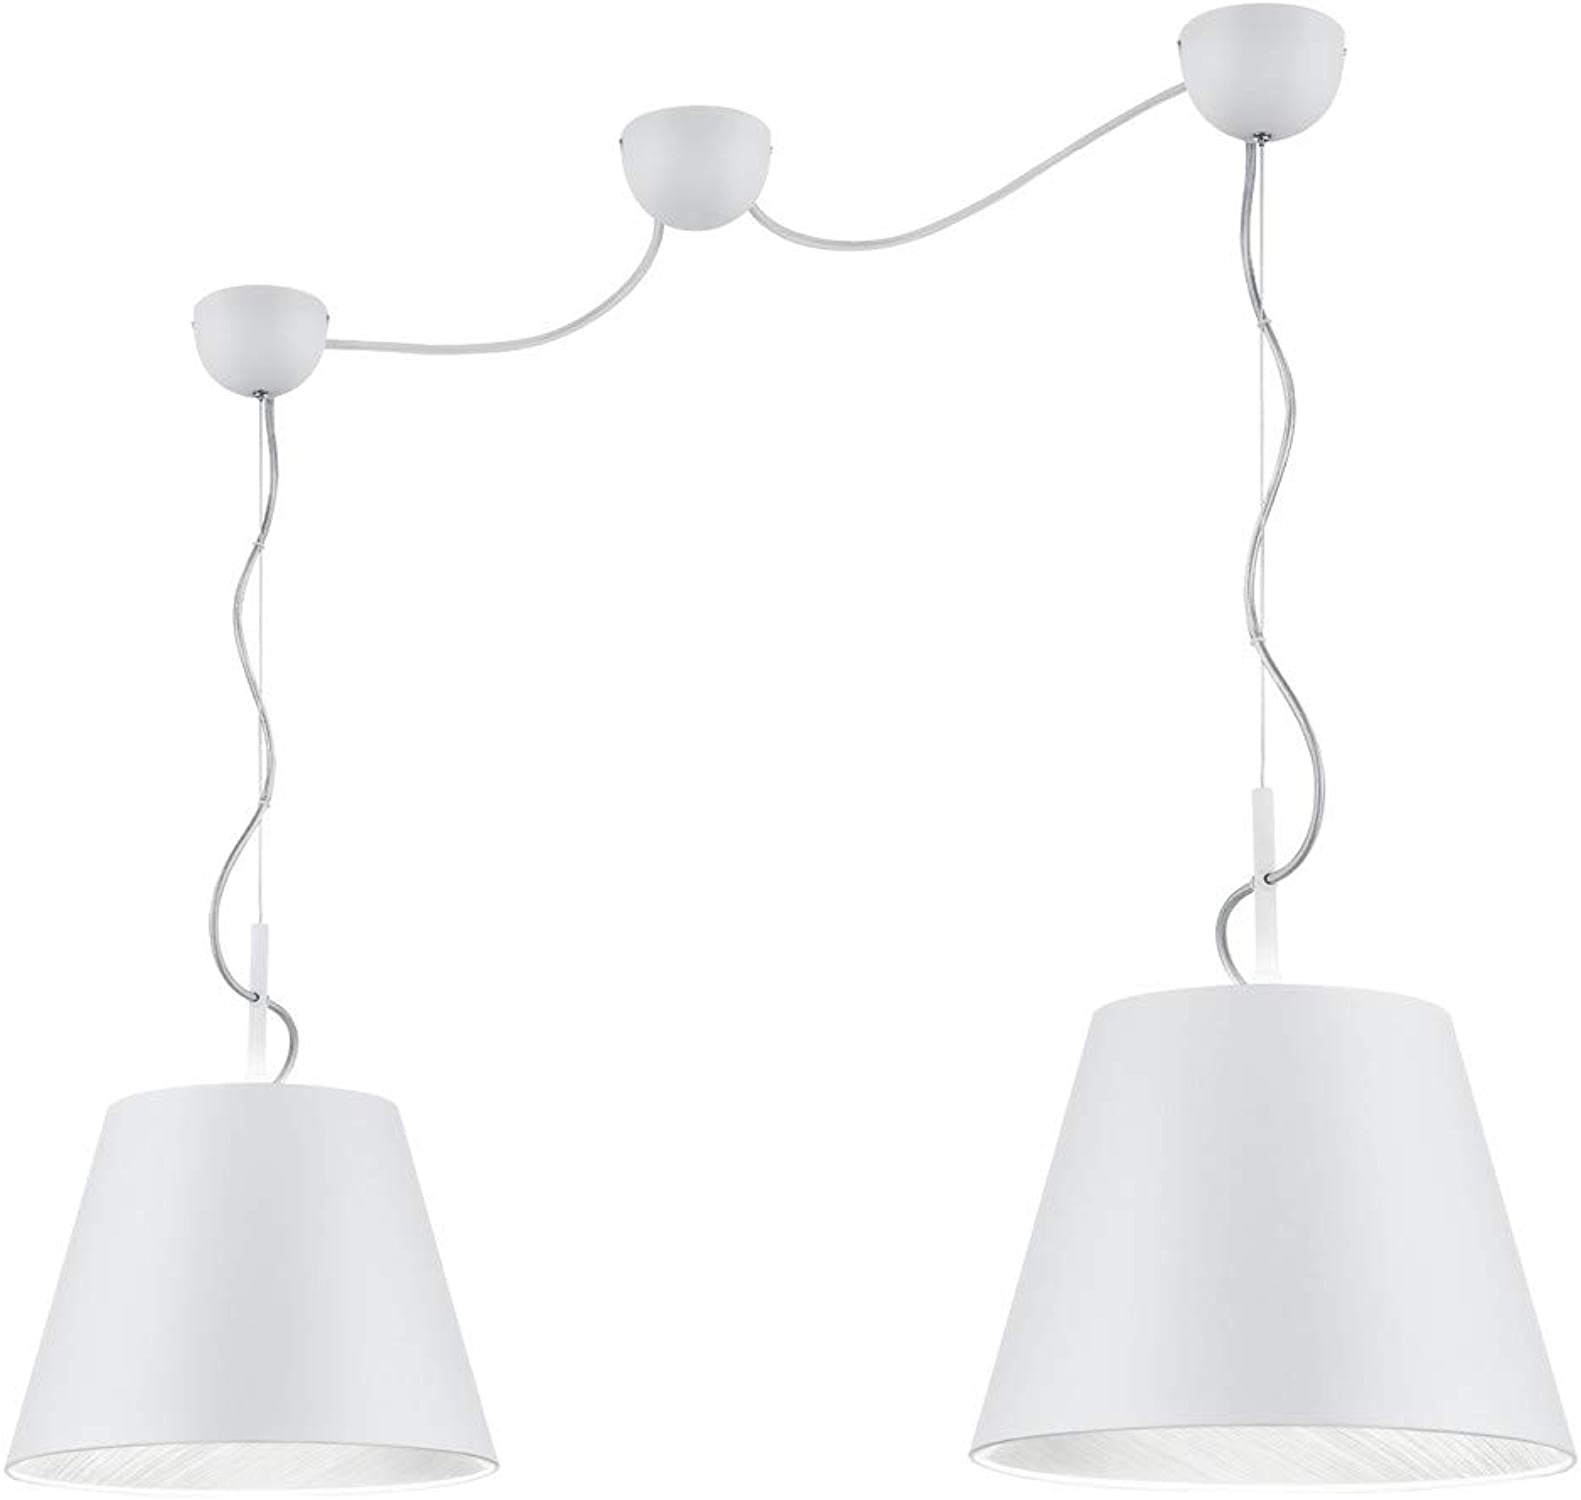 Trio Leuchten 307500289 Lampe suspendue, Métal, Blanc Matt argentfarbig